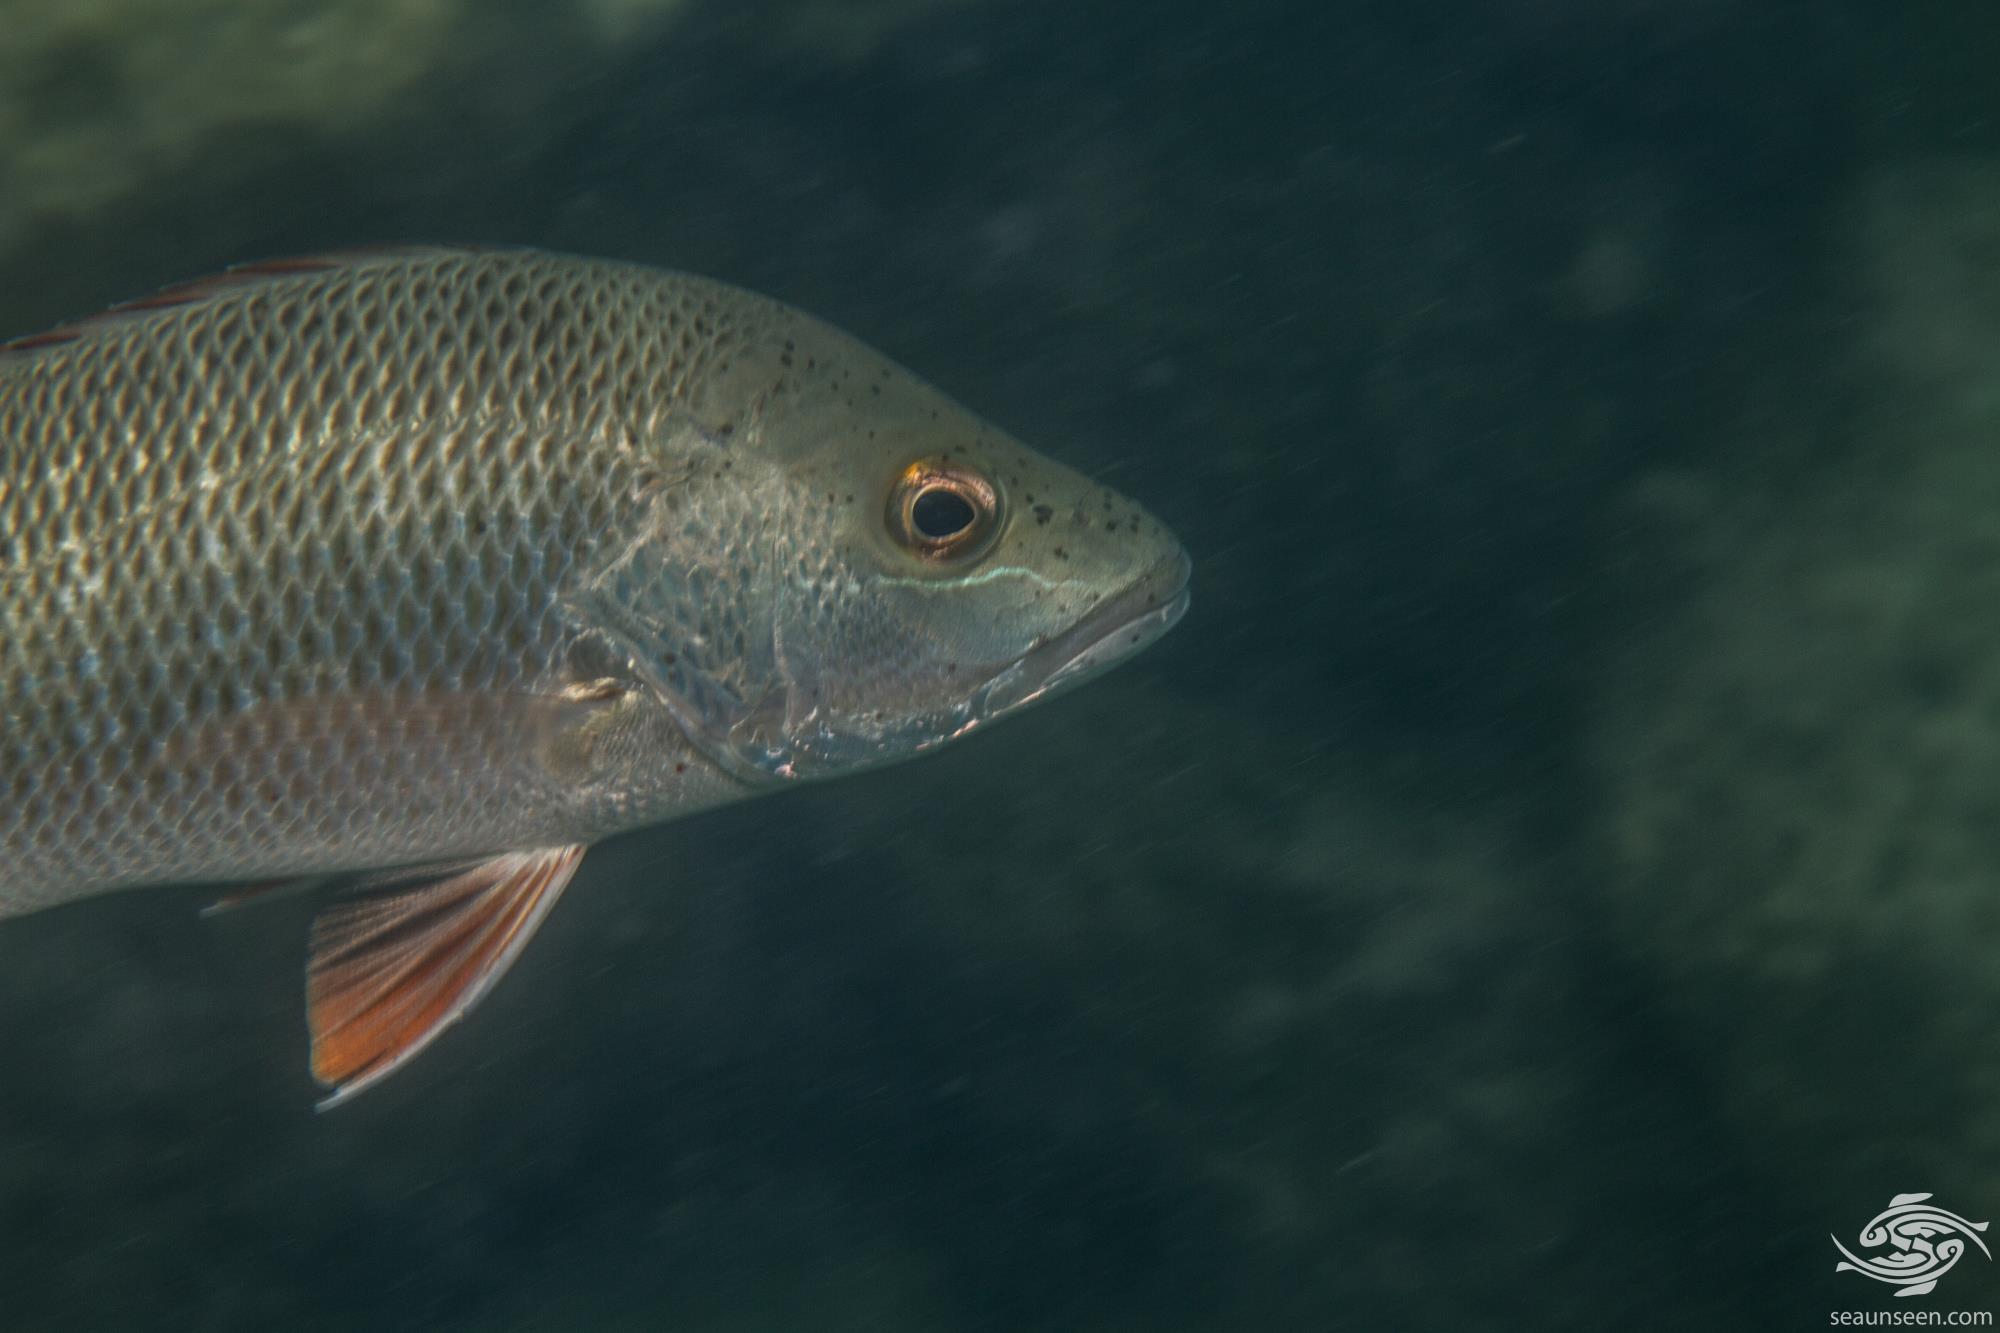 Red Snapper (Lutjanus bohar) is also known as the Twinspot Snapper, the Two-spot Red snapper and the Bohar Snapper